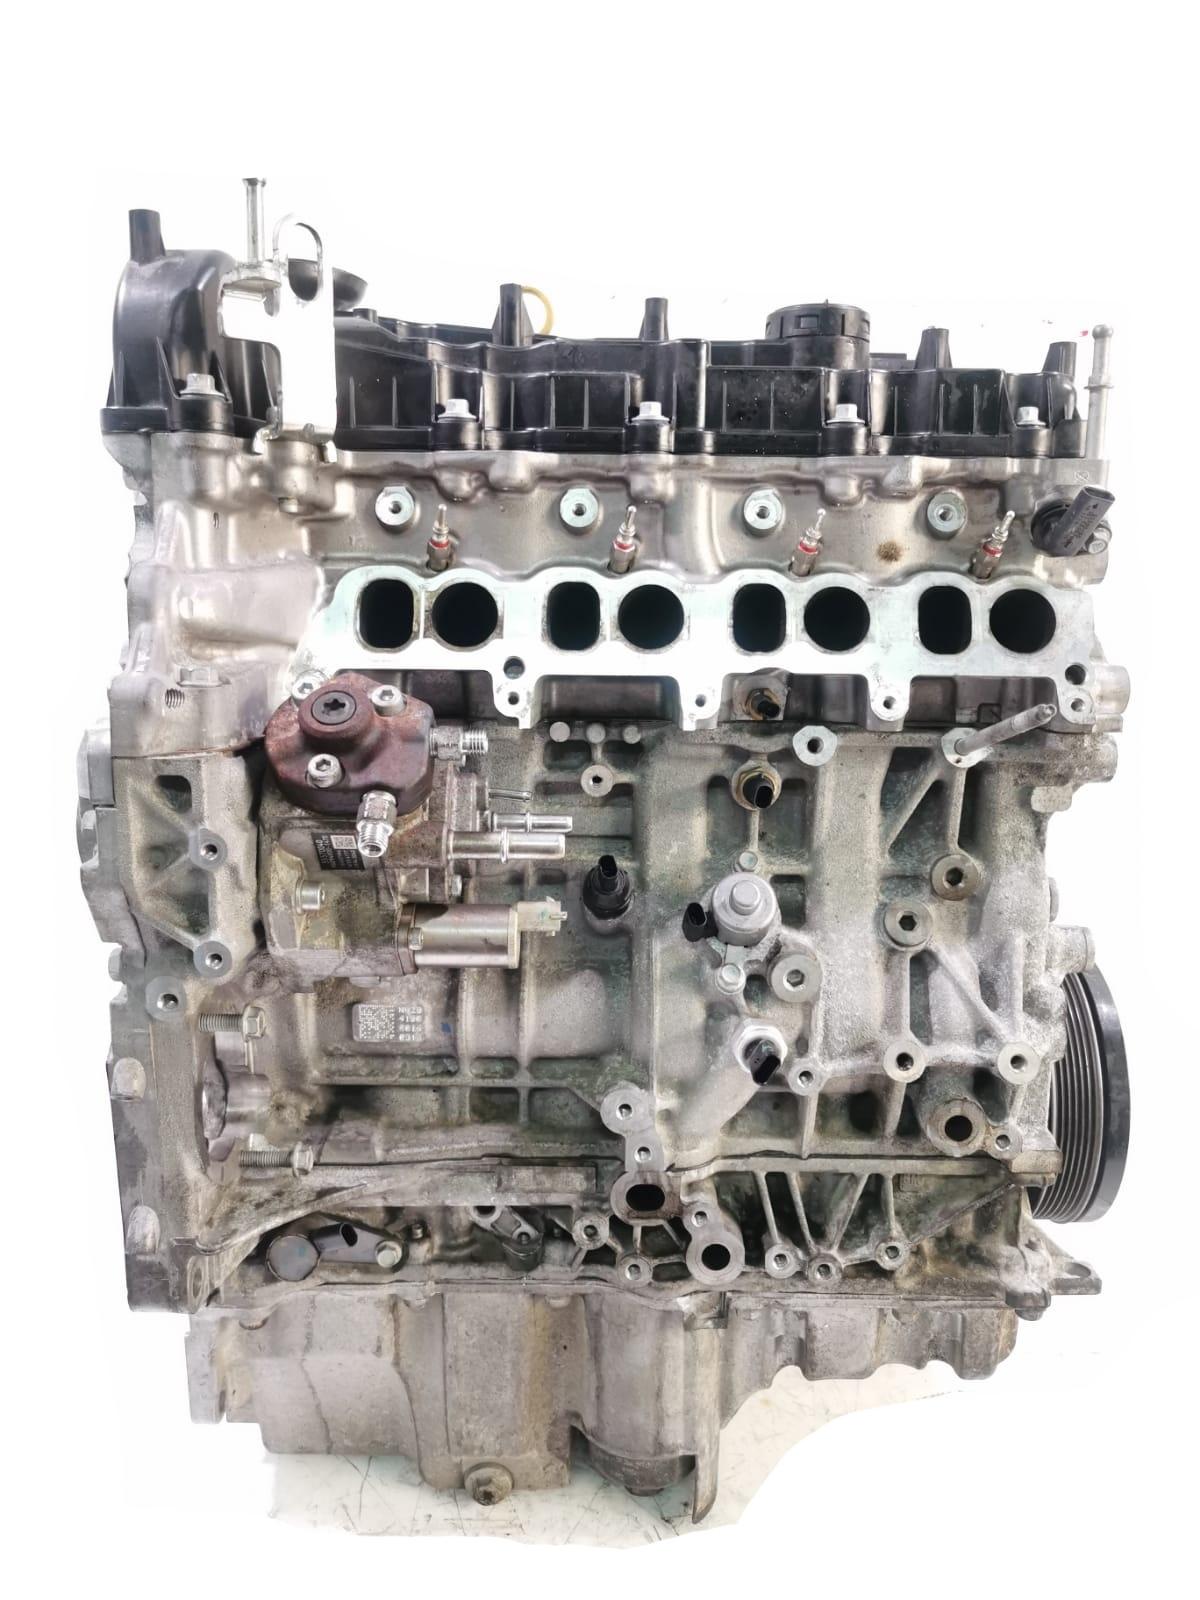 Motor Opel Astra Insignia Meriva Mokka Zafira 1,6 CDTI B16 B16DTH 55570040